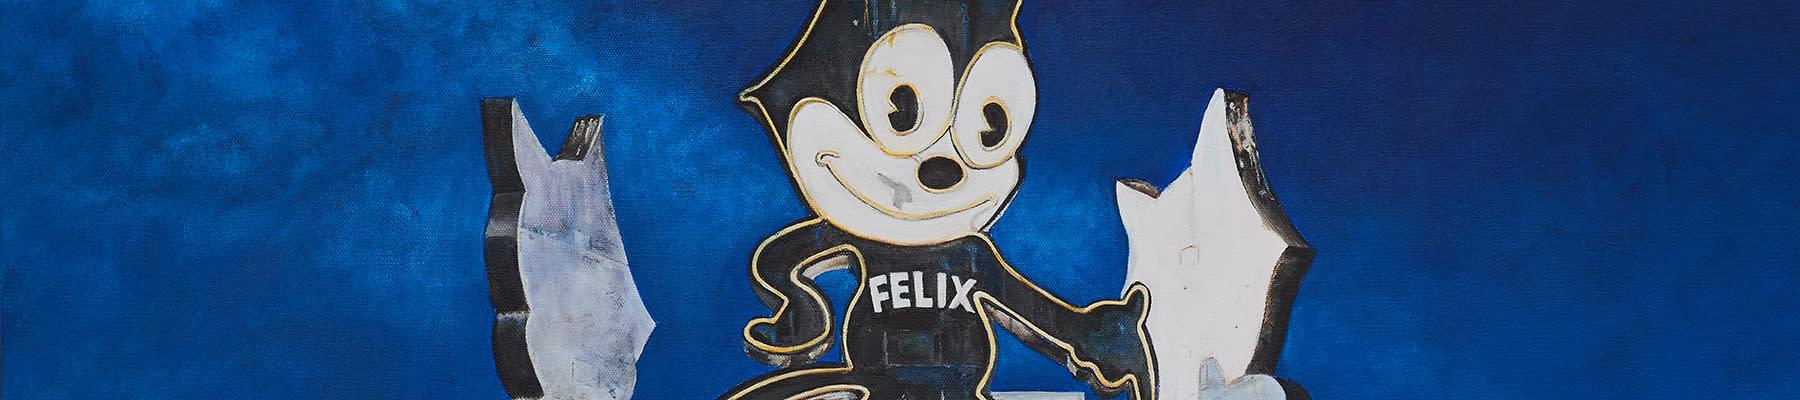 <div class='title'>           felix4417         </div>